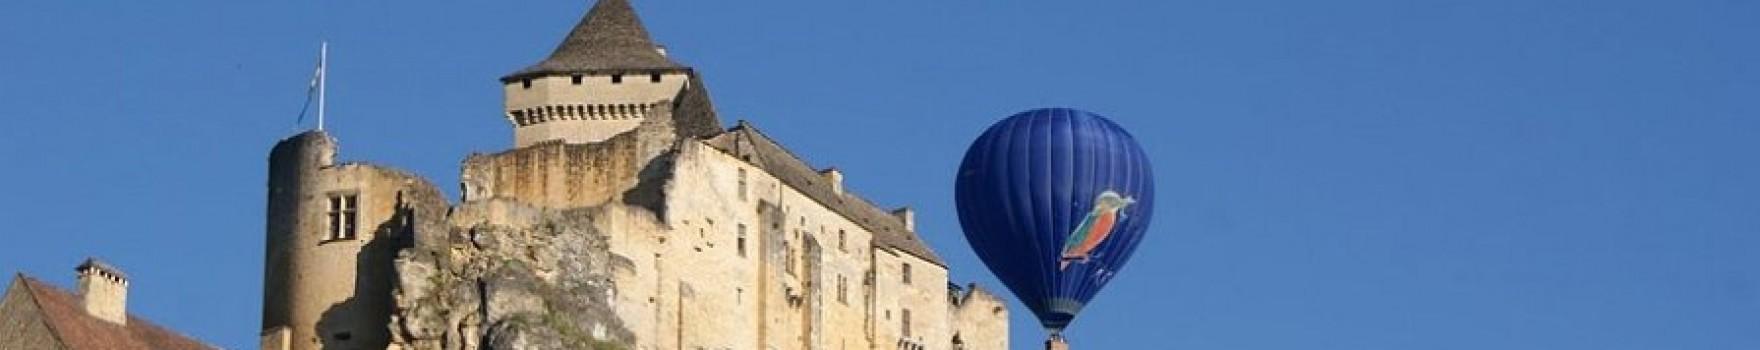 Activités aériennes en Périgord